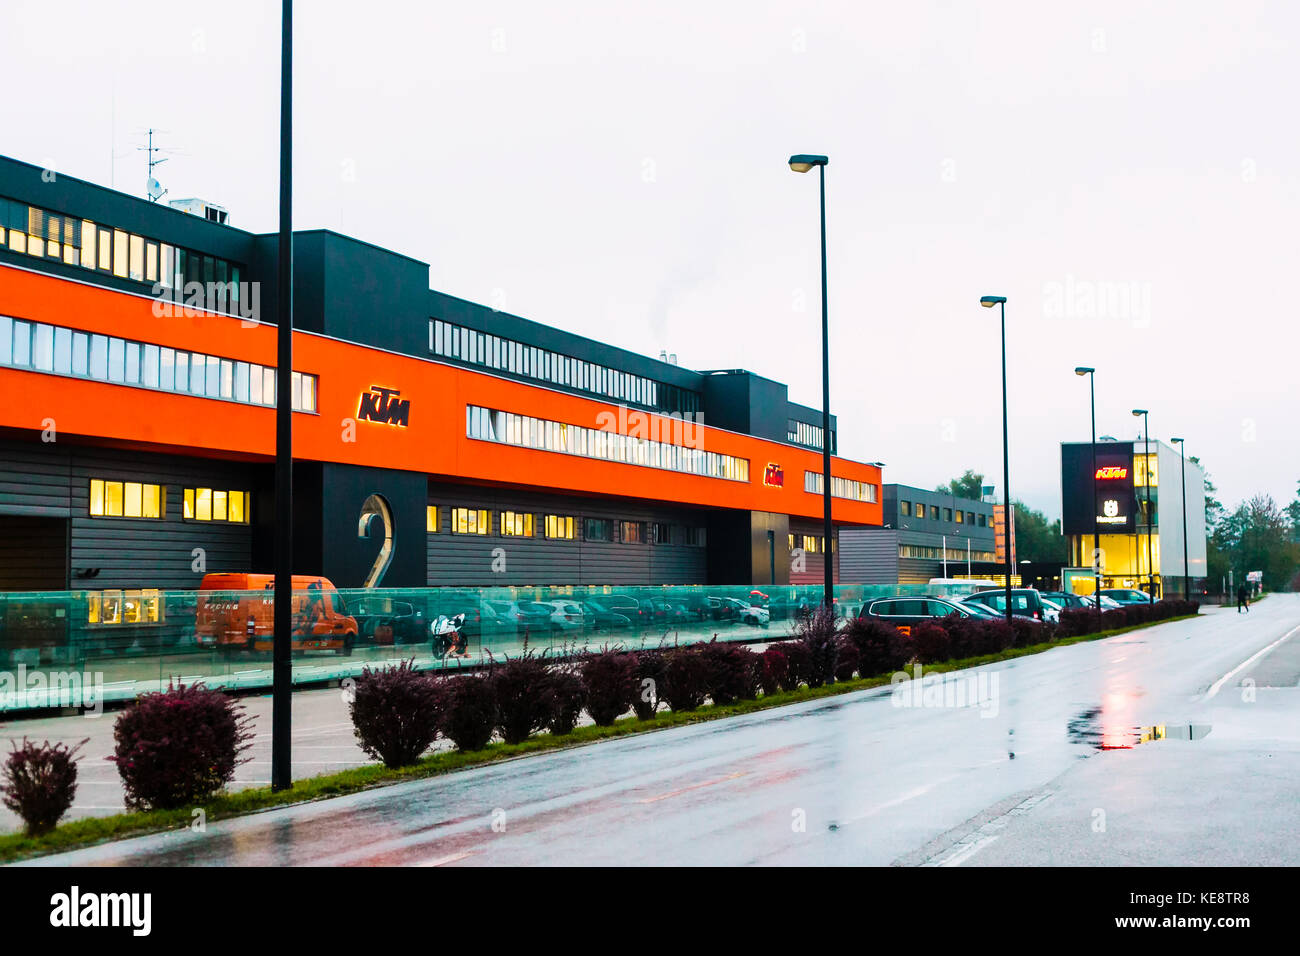 MATTIGHOFEN, AUSTRIA - OCTOBER 19, 2015: The headquarters for Kraftfahrzeug Trunkenpolz Mattighofen (KTM), in Mattighofen, - Stock Image